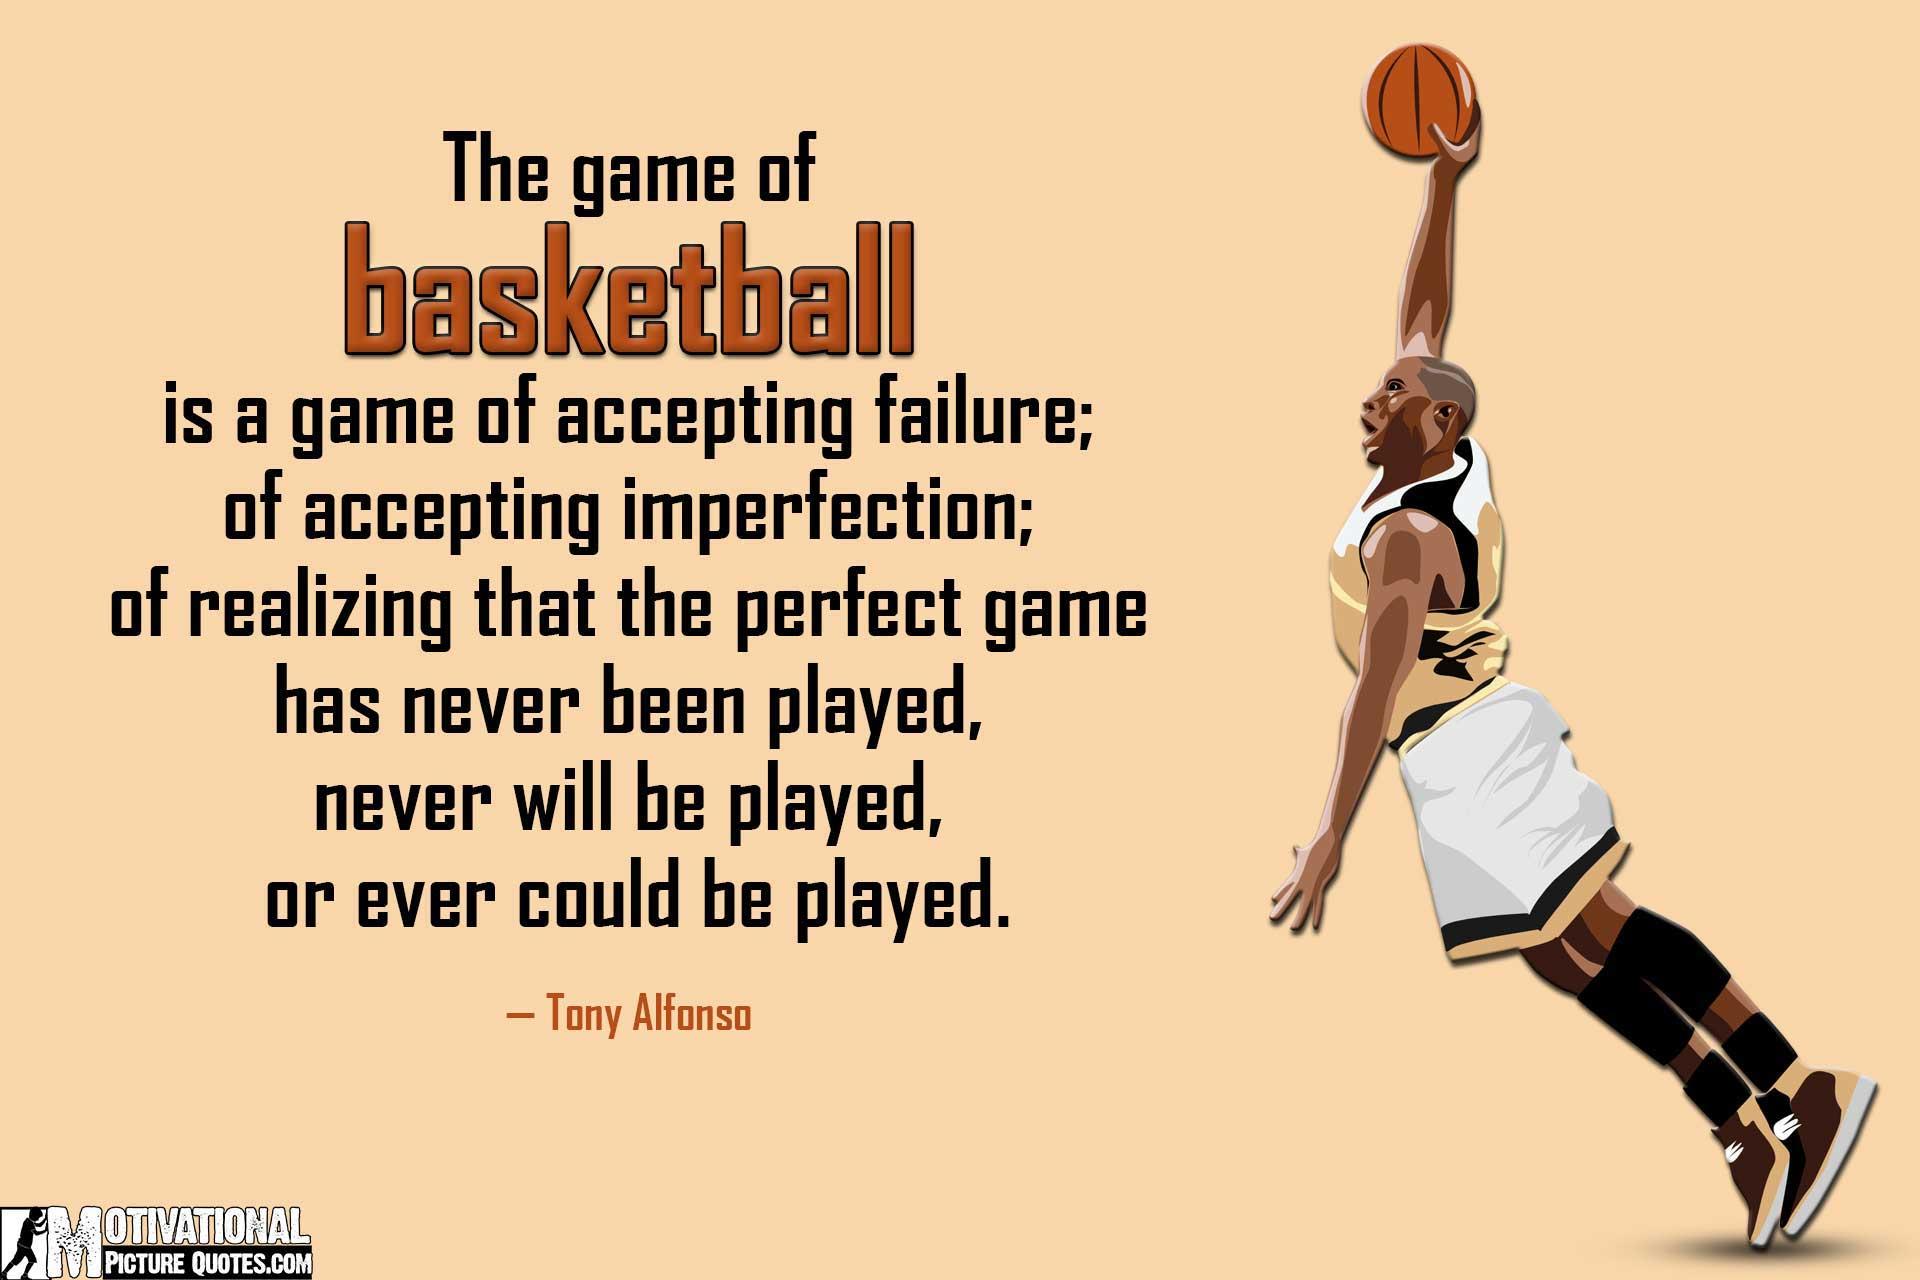 Inspirational Basketball Quotes 50 Inspirational Basketball Quotes With Pictures  Insbright